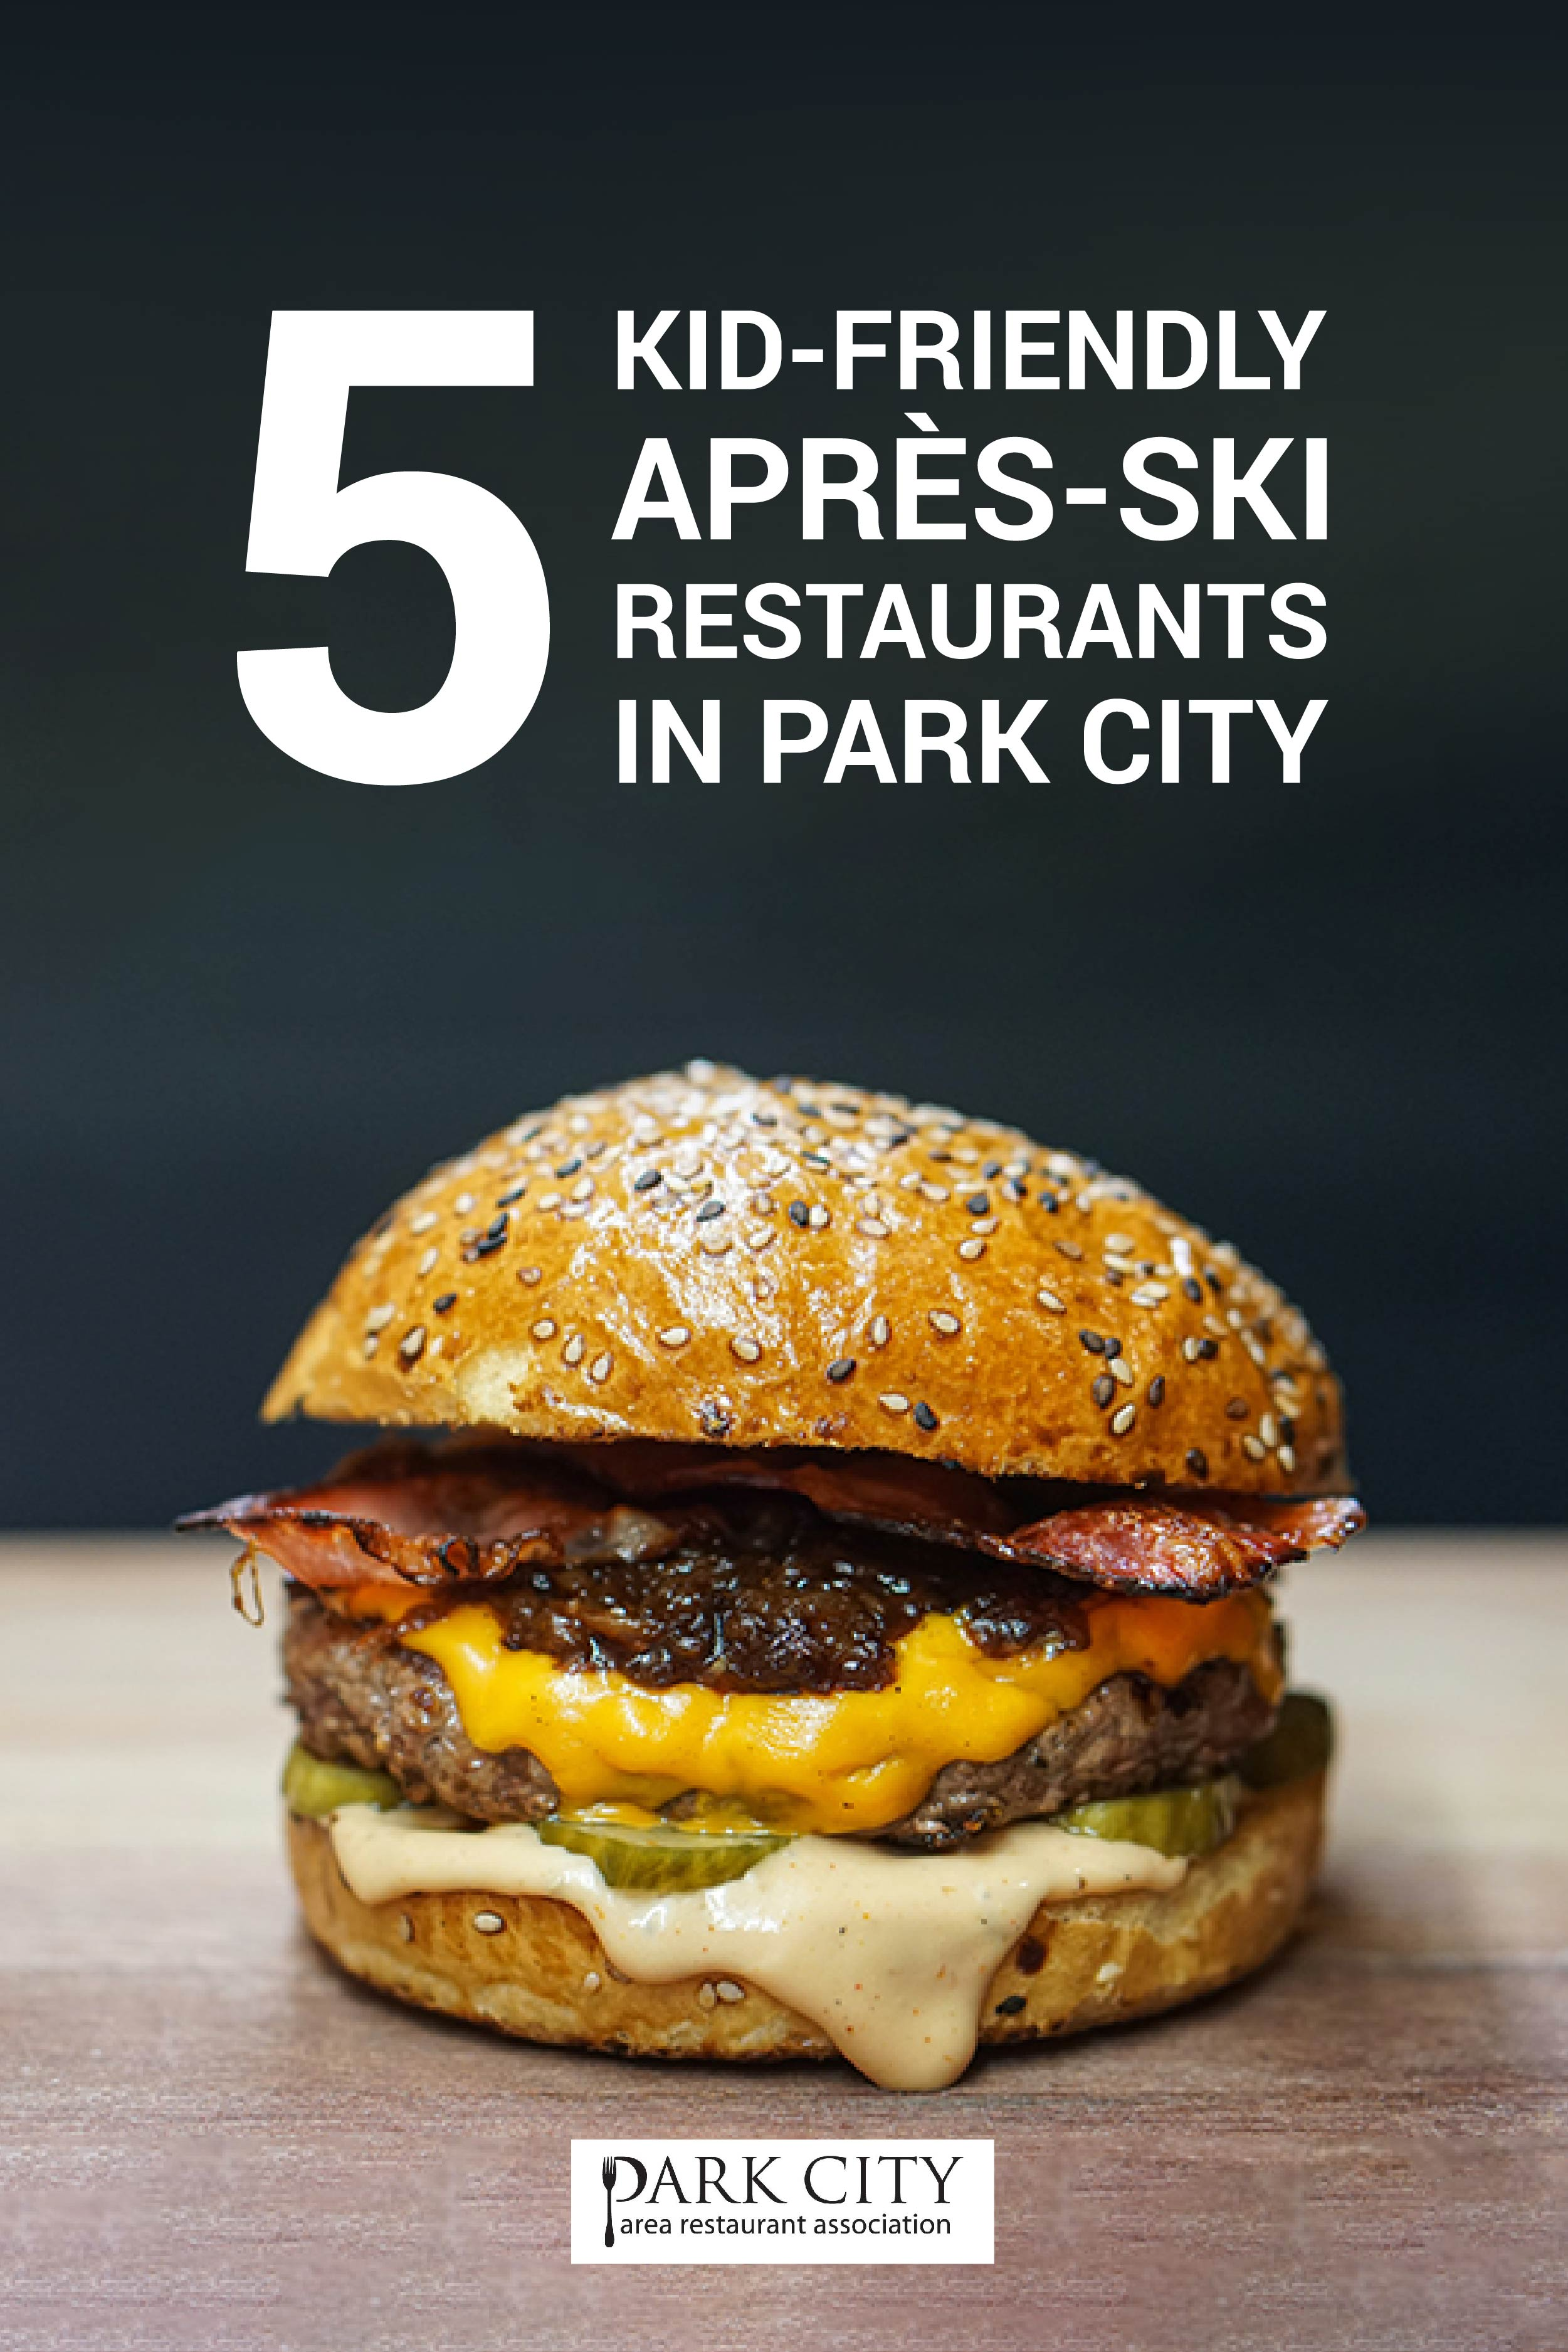 5-kid-friendly-apres-ski-restaurants-in-park-city